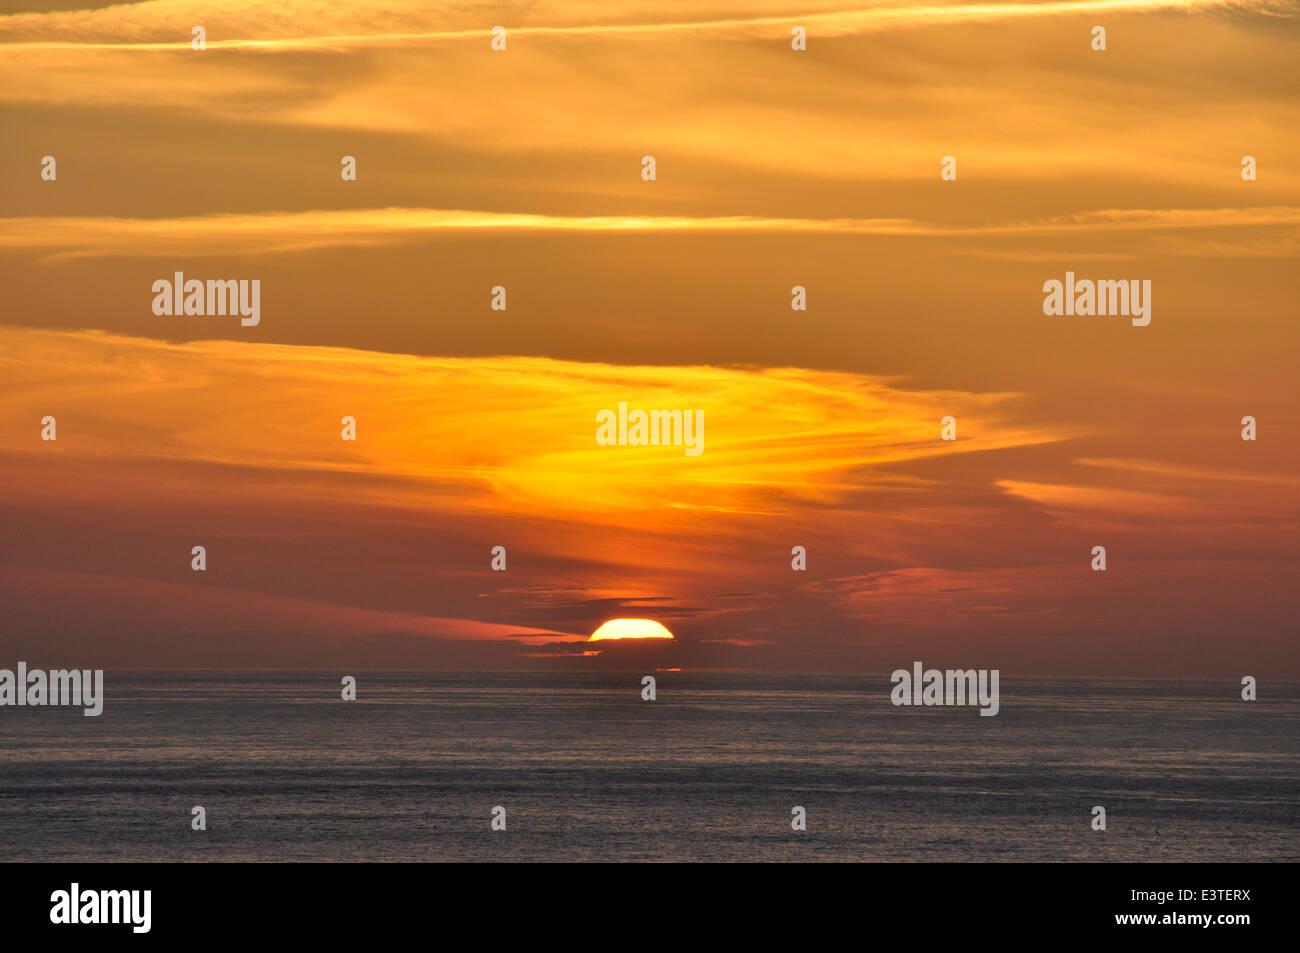 Cornwall - North Coast path - sunset over the sea - orange - red - gold - sky over a dark reflective sea - Stock Image